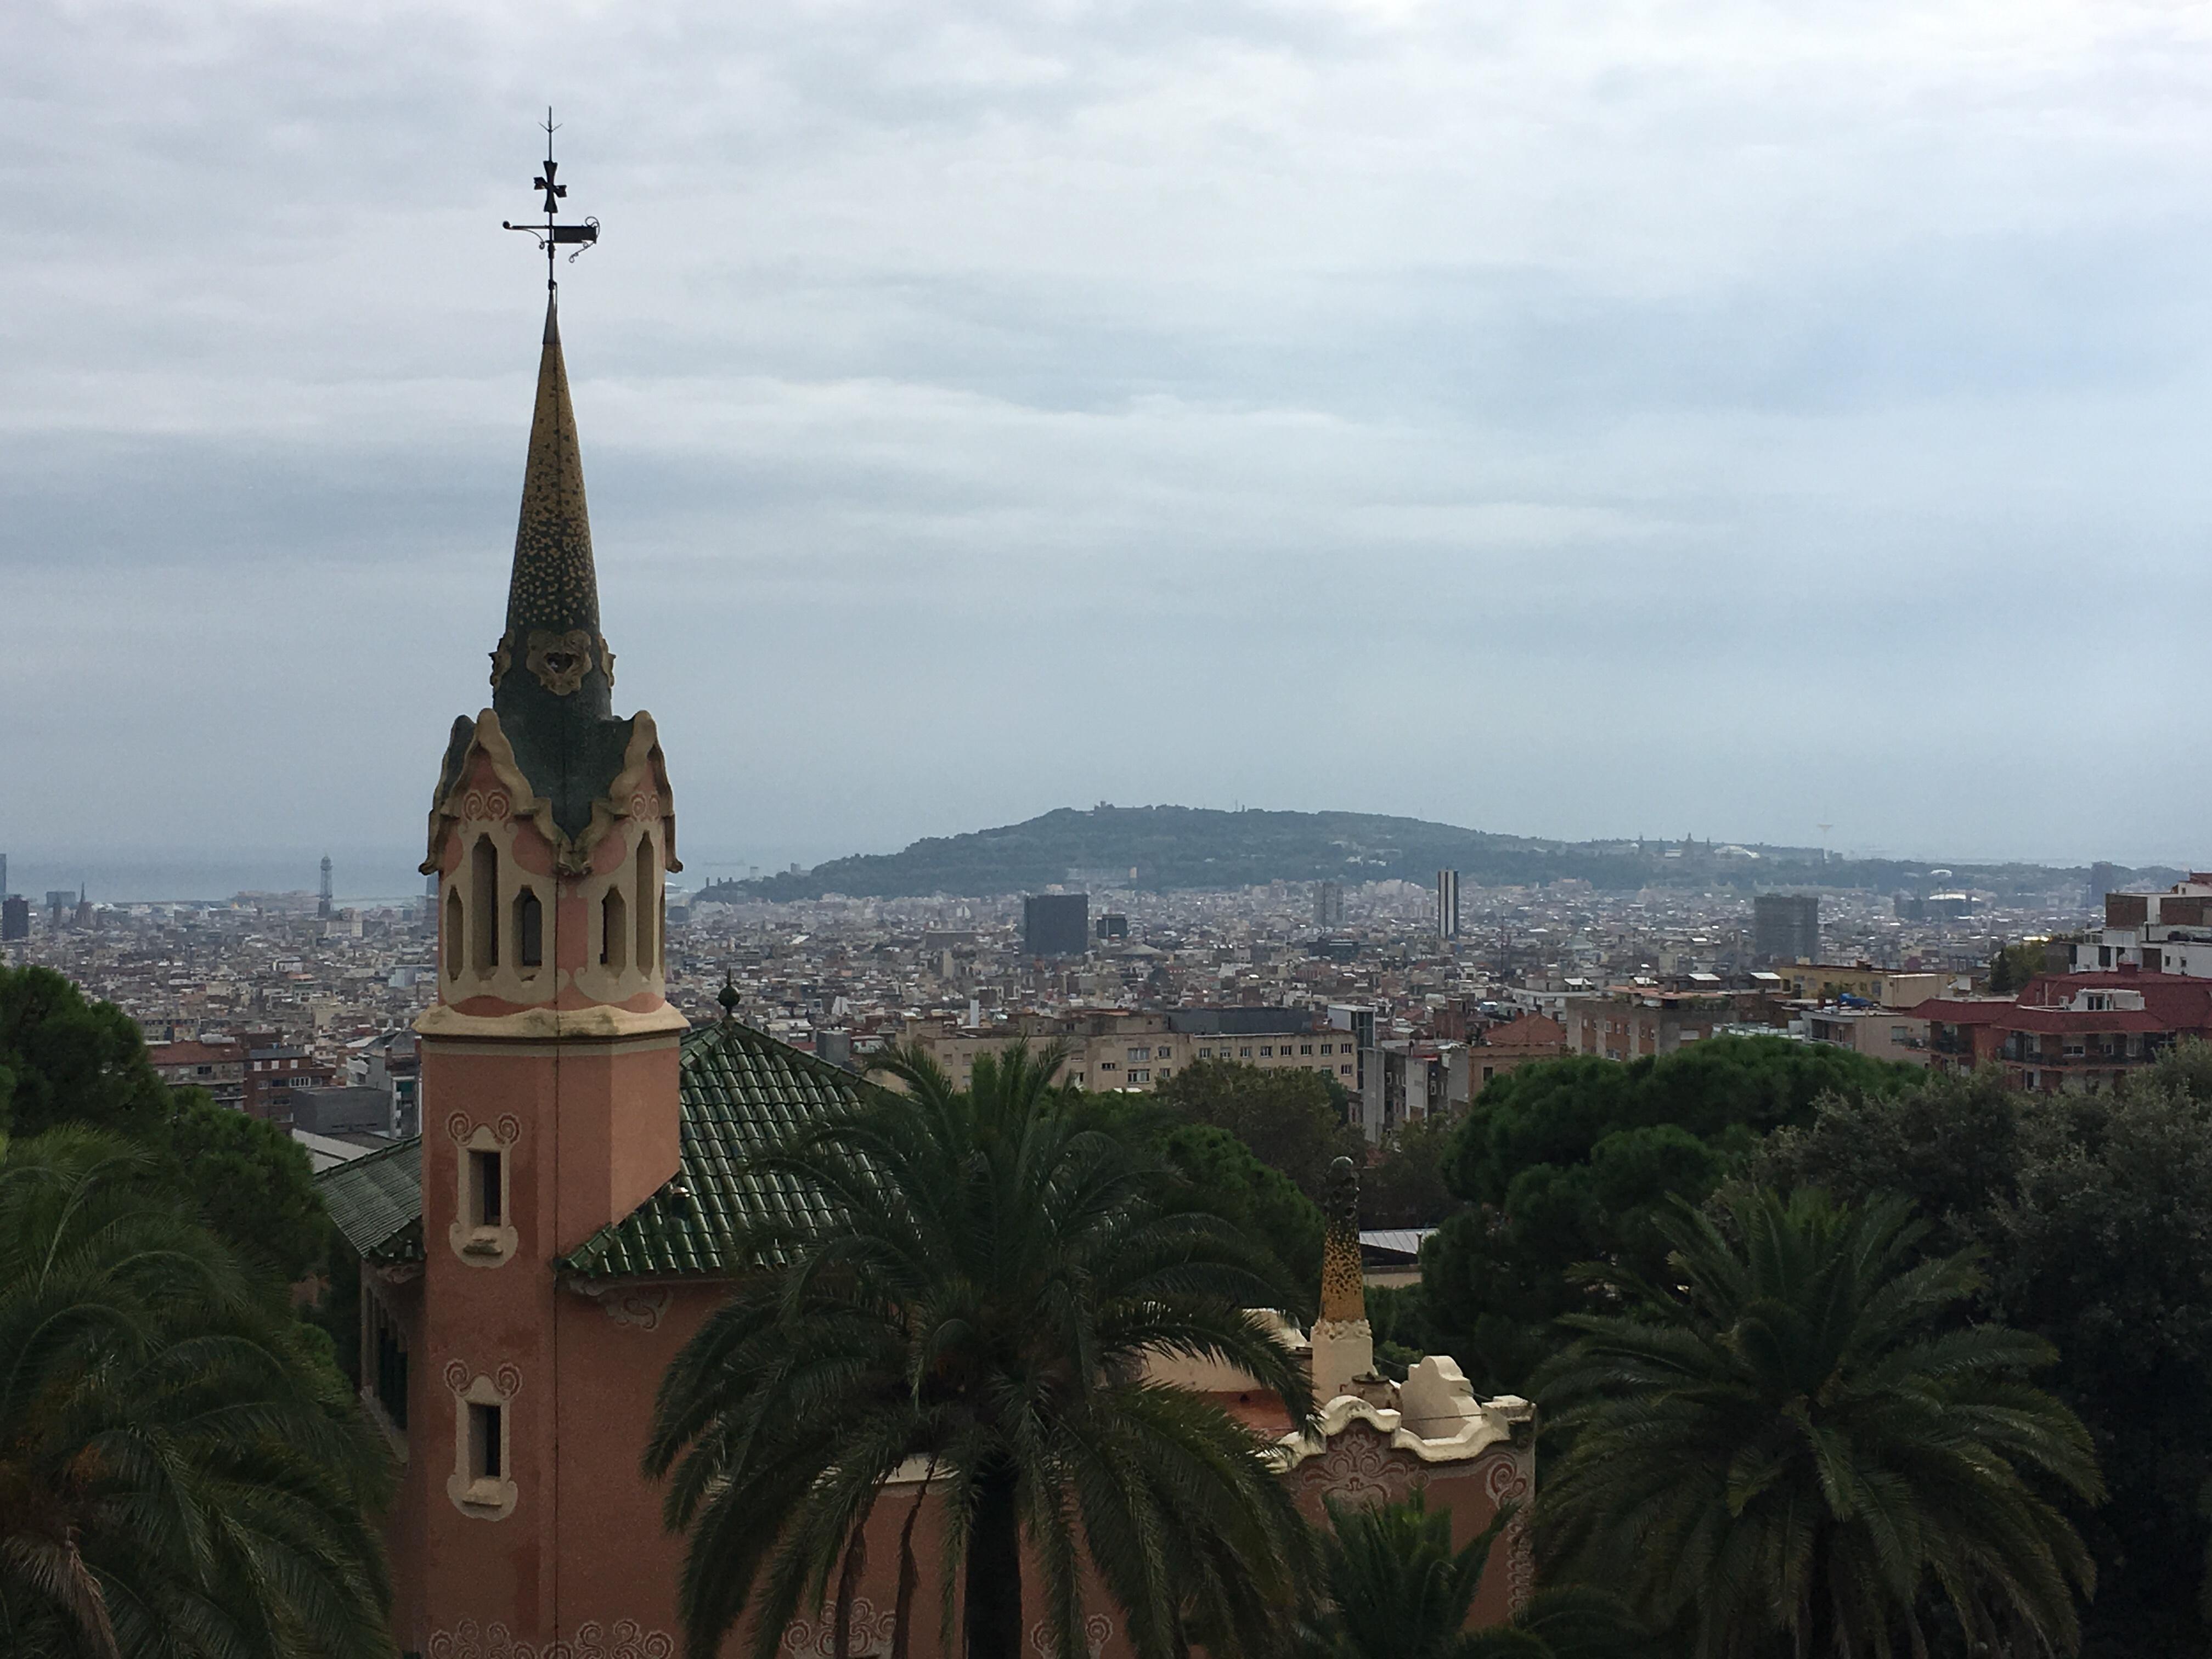 Barcelona as viewed from Park Güell